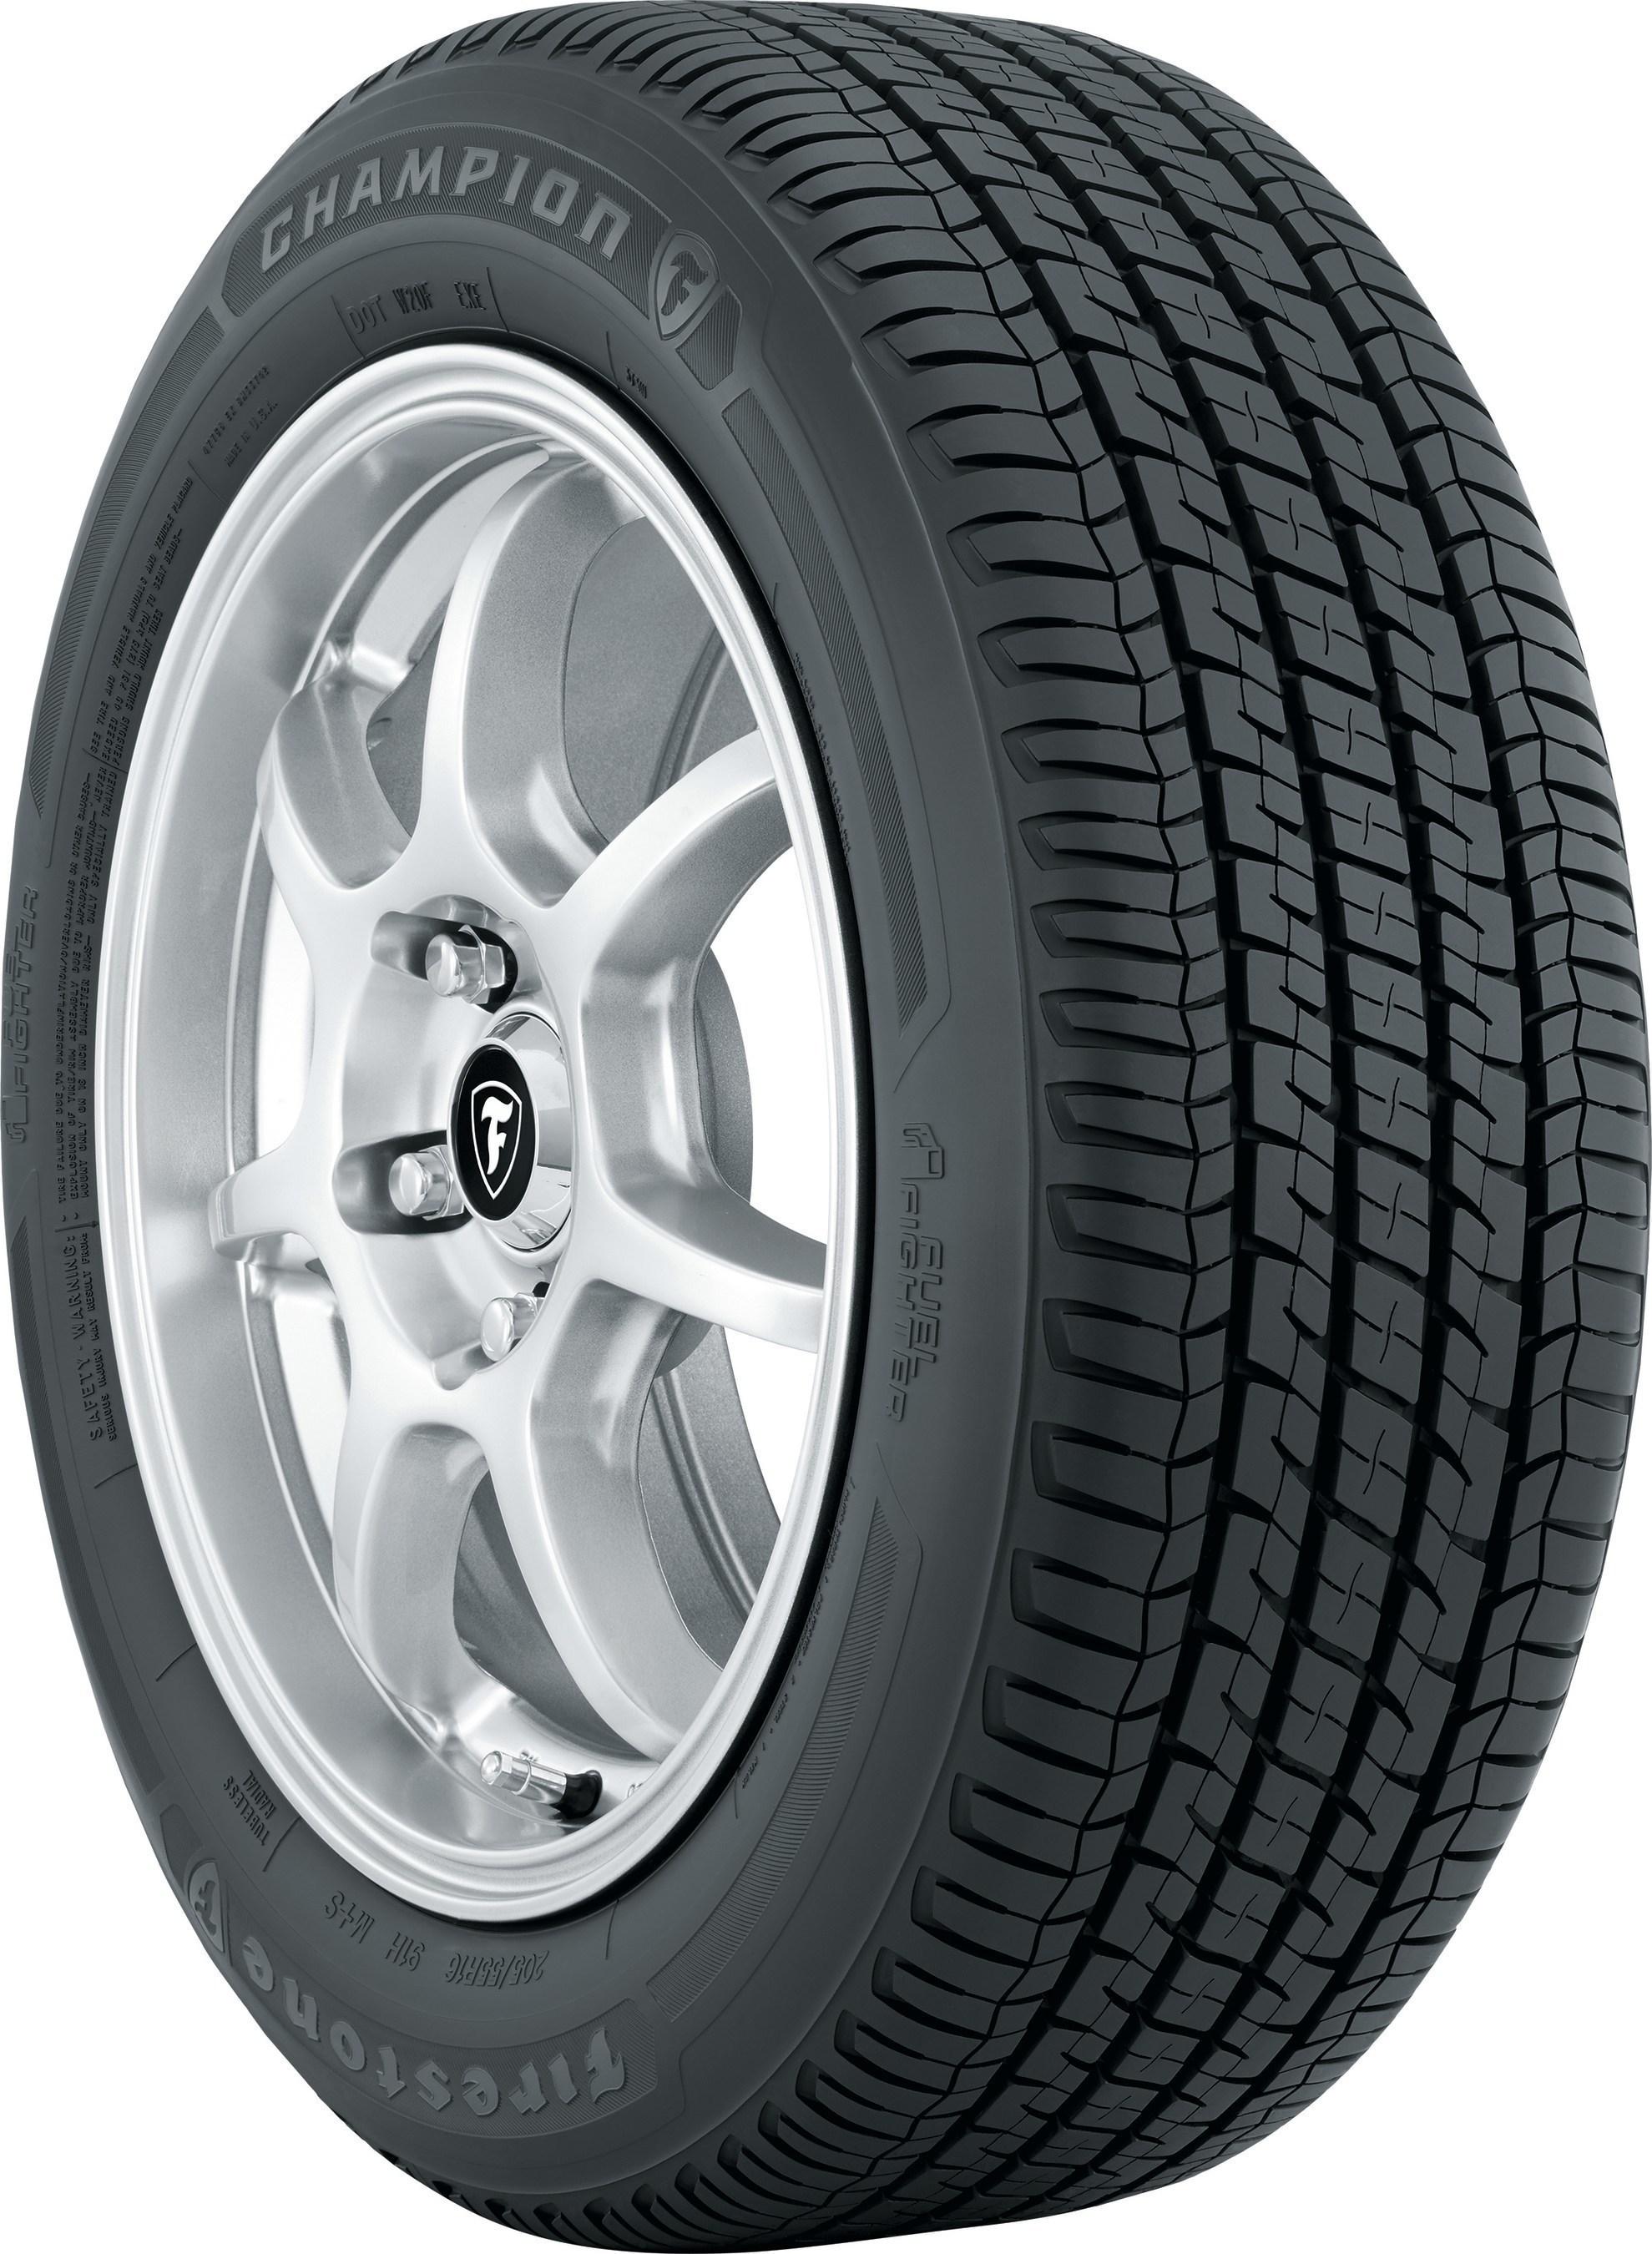 New Firestone Tire Built to Go Farther Last Longer